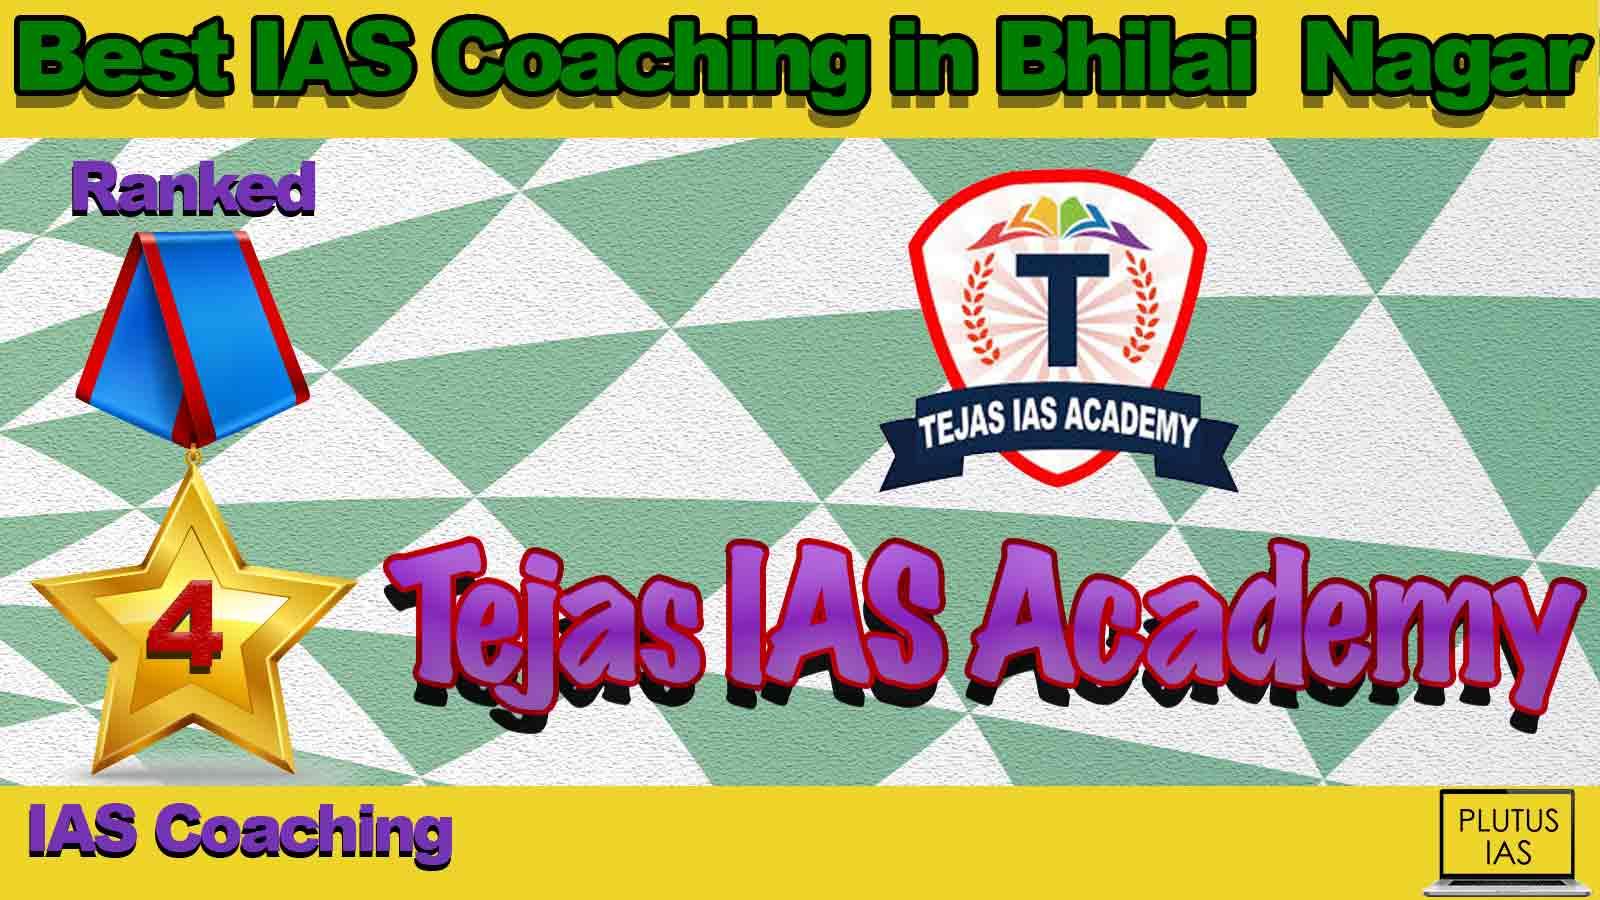 Best IAS Coaching in Bhilai Nagar